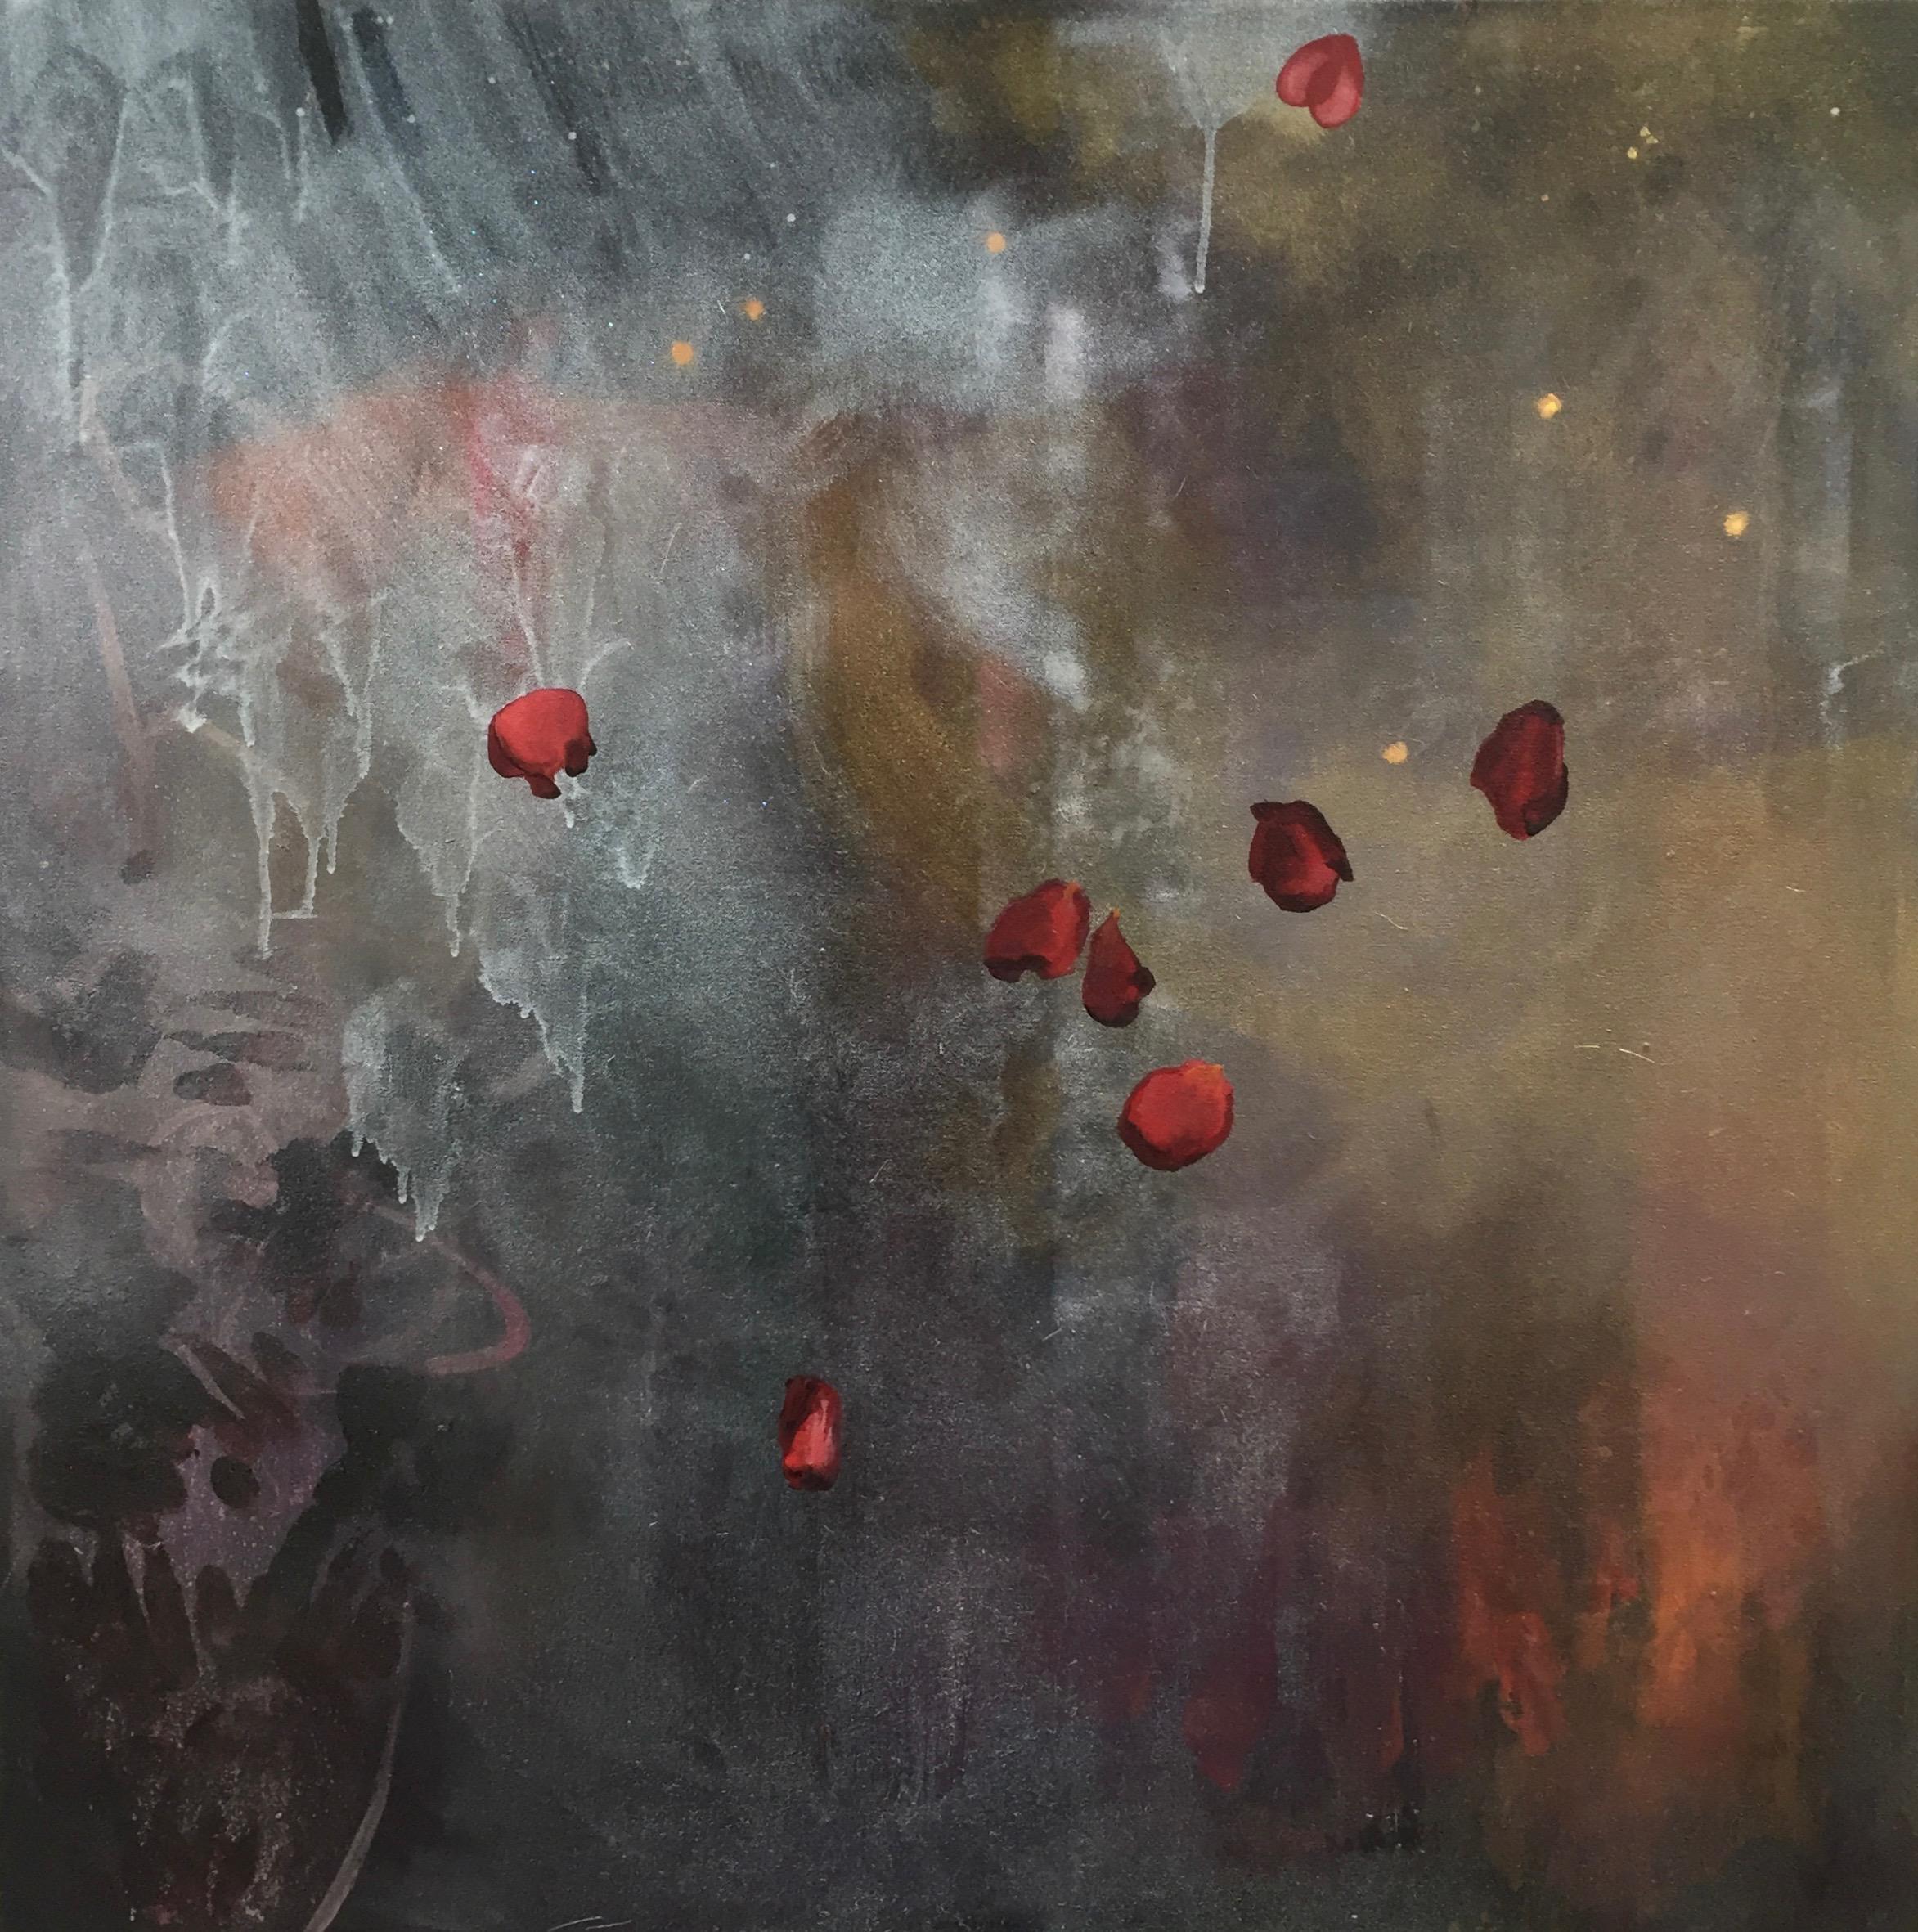 Helios Series/Throwing Stones Into the Black Pool